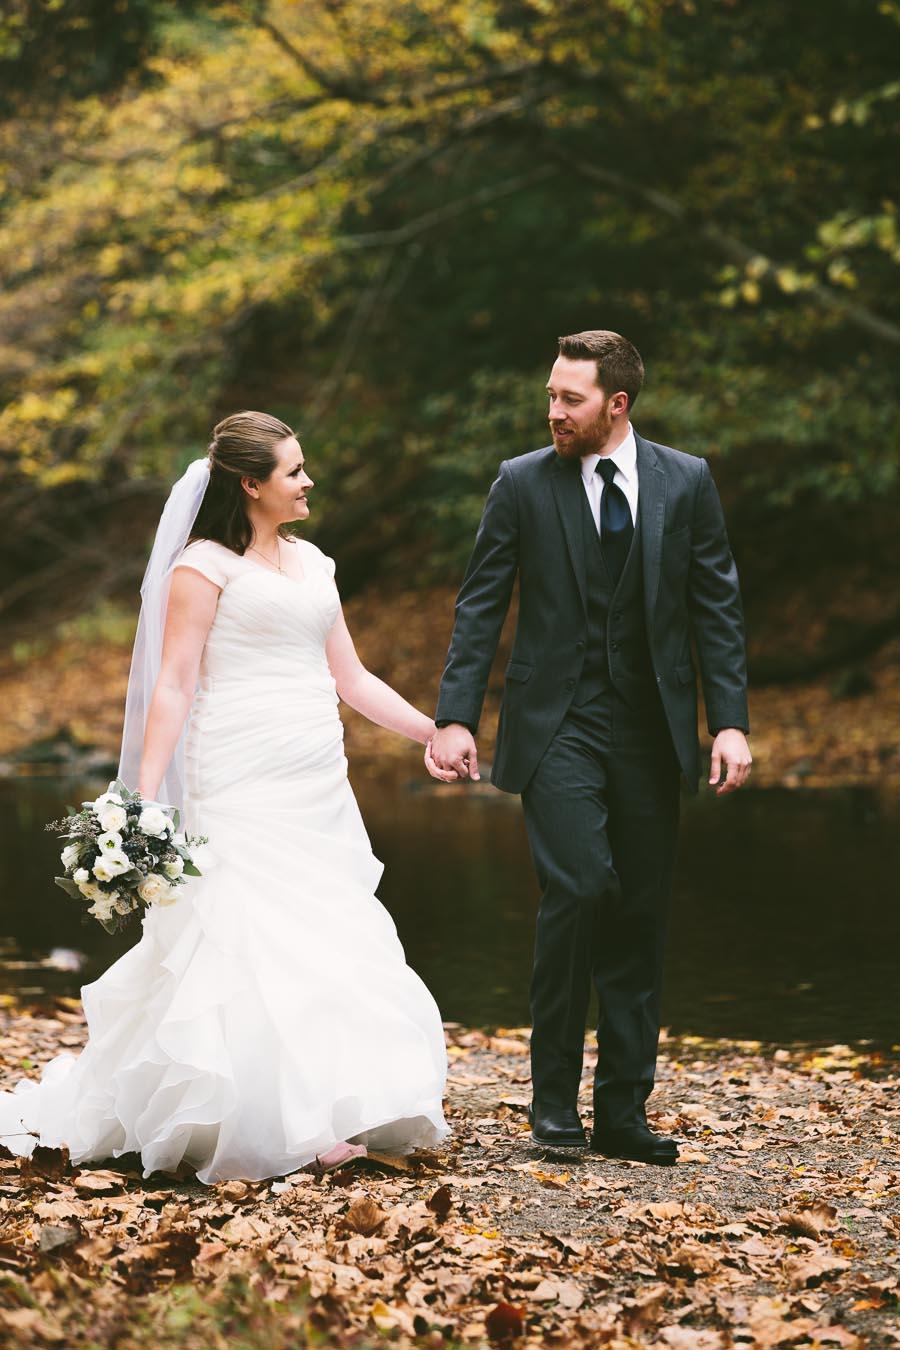 landolls-mohican-castle-wedding-photography-30.jpg